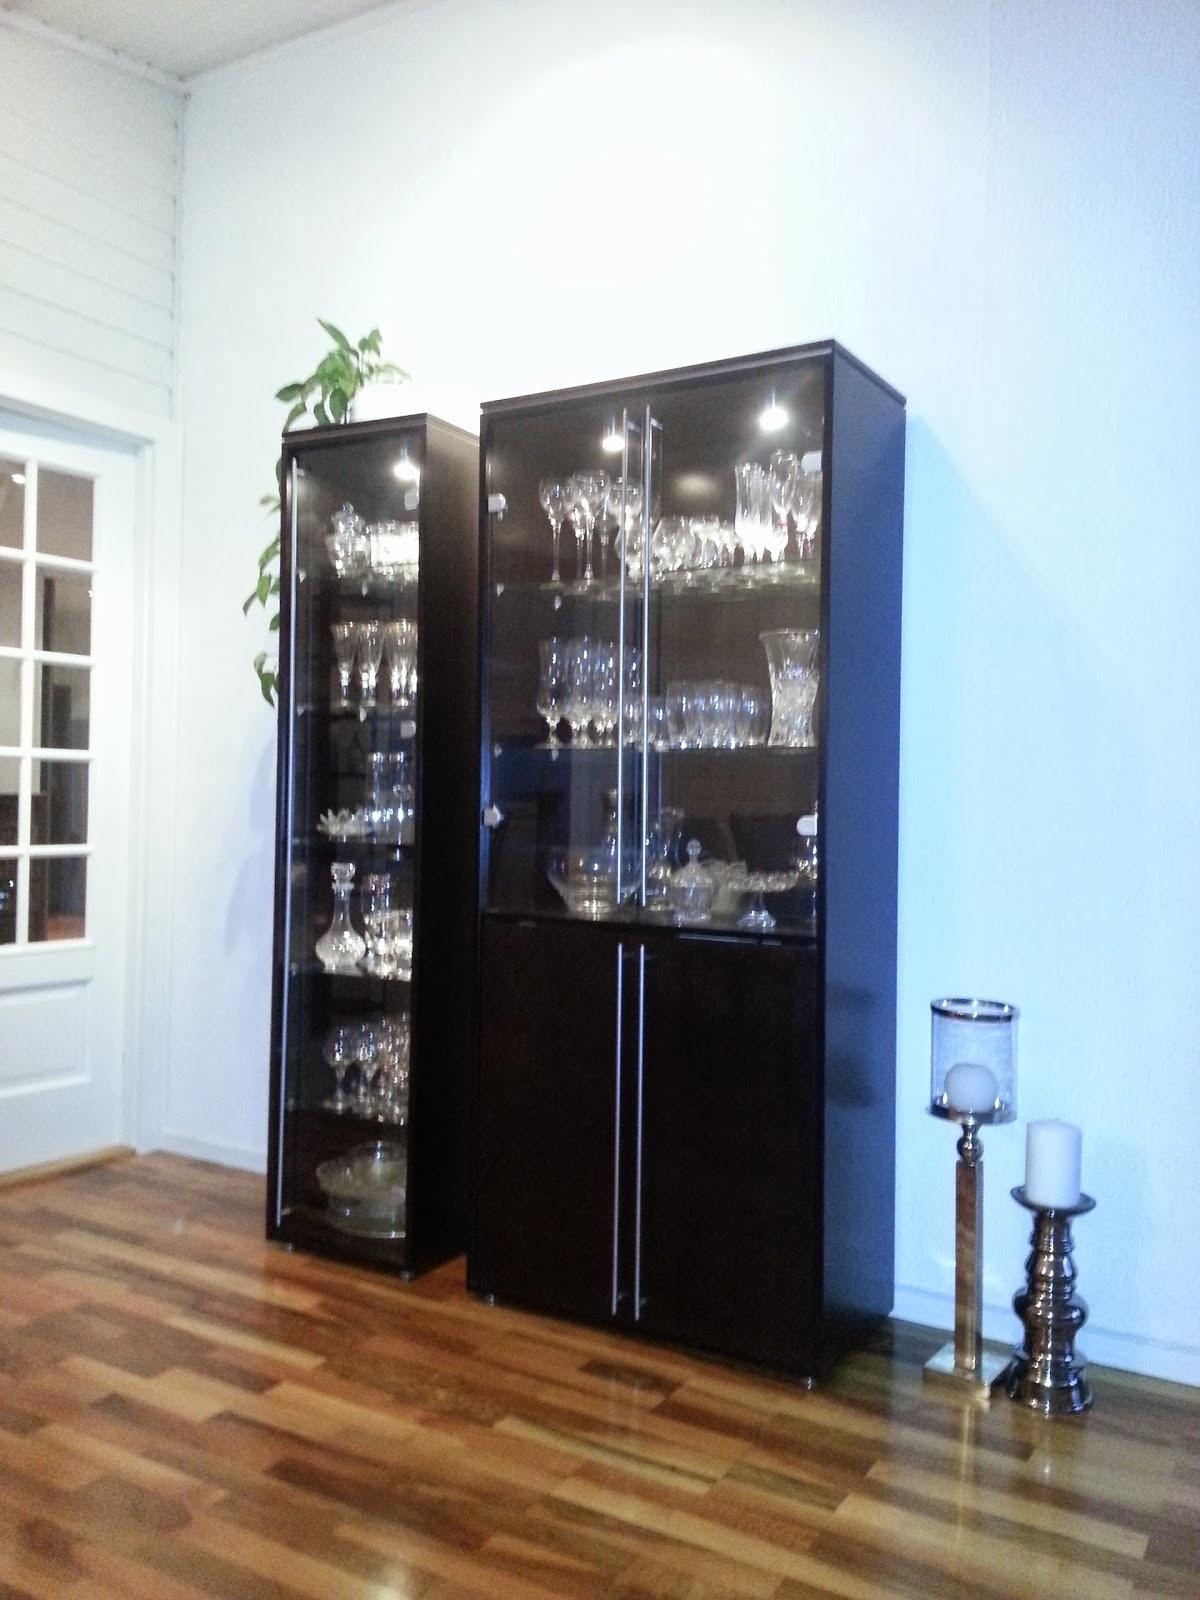 Eilas blogg: hjemmet vårt